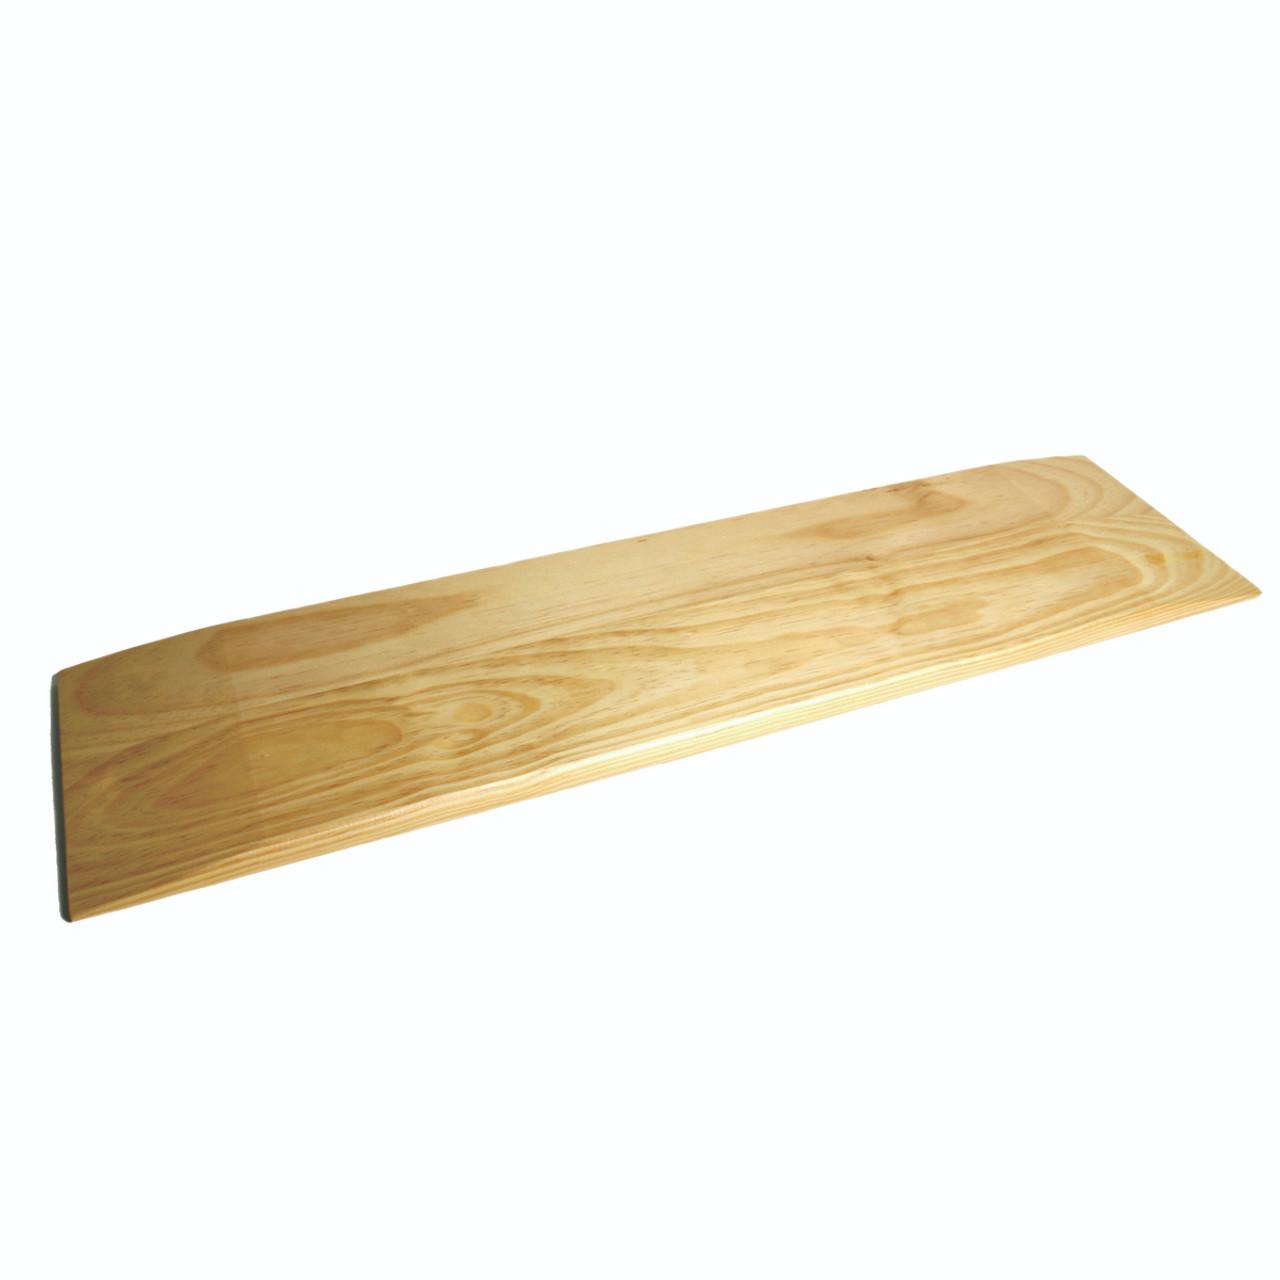 "Transfer Board, Wood, 8"" x 30"", no handgrip"